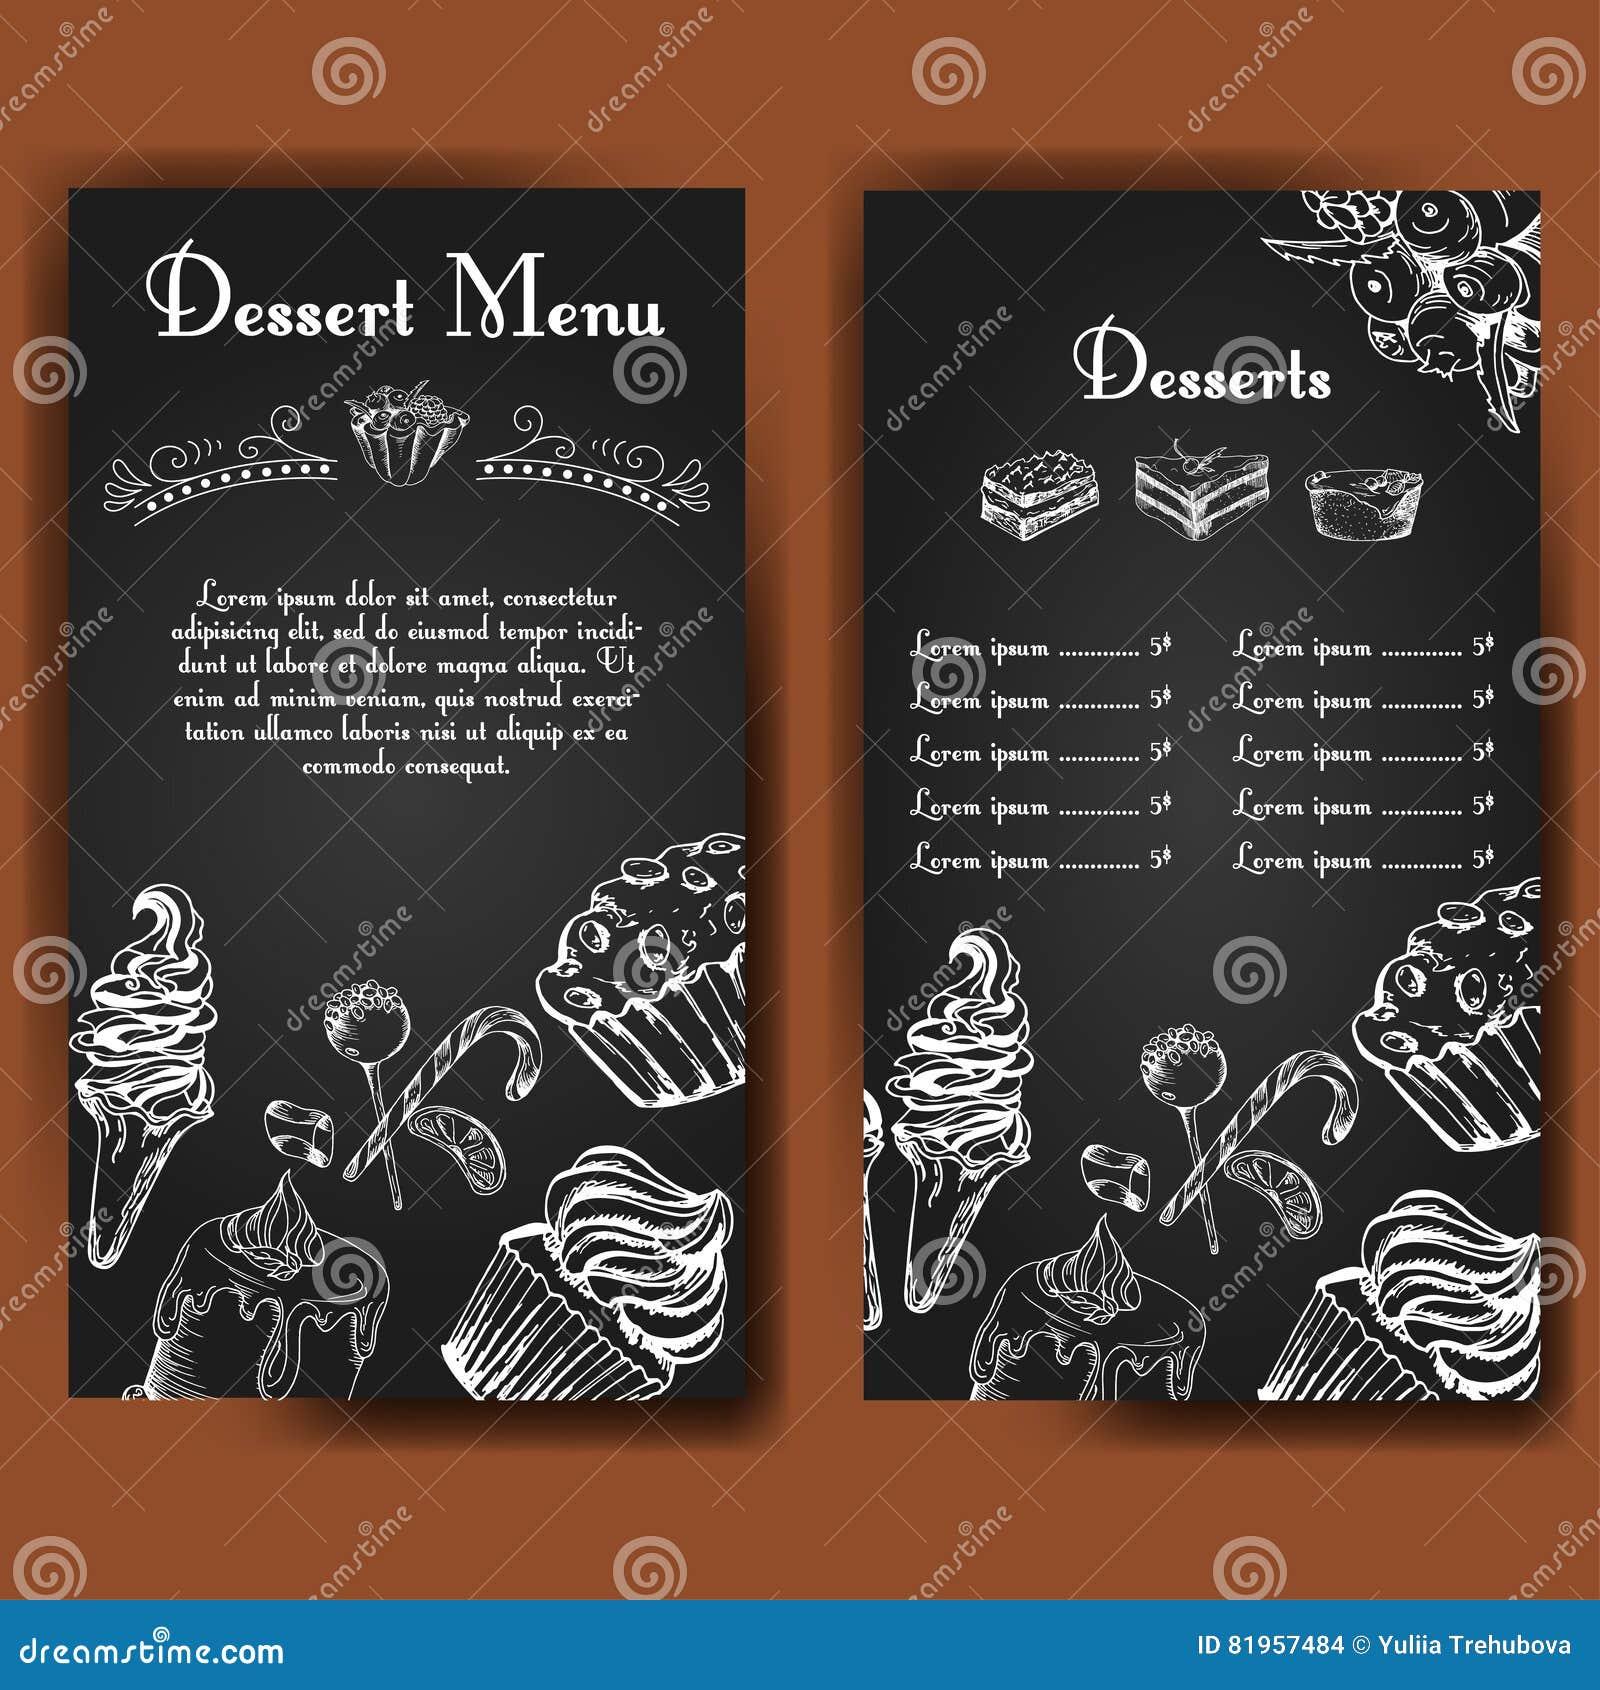 template for dessert menu with sweet tasty cakes hand drawn design for poster restaurant menu. Black Bedroom Furniture Sets. Home Design Ideas